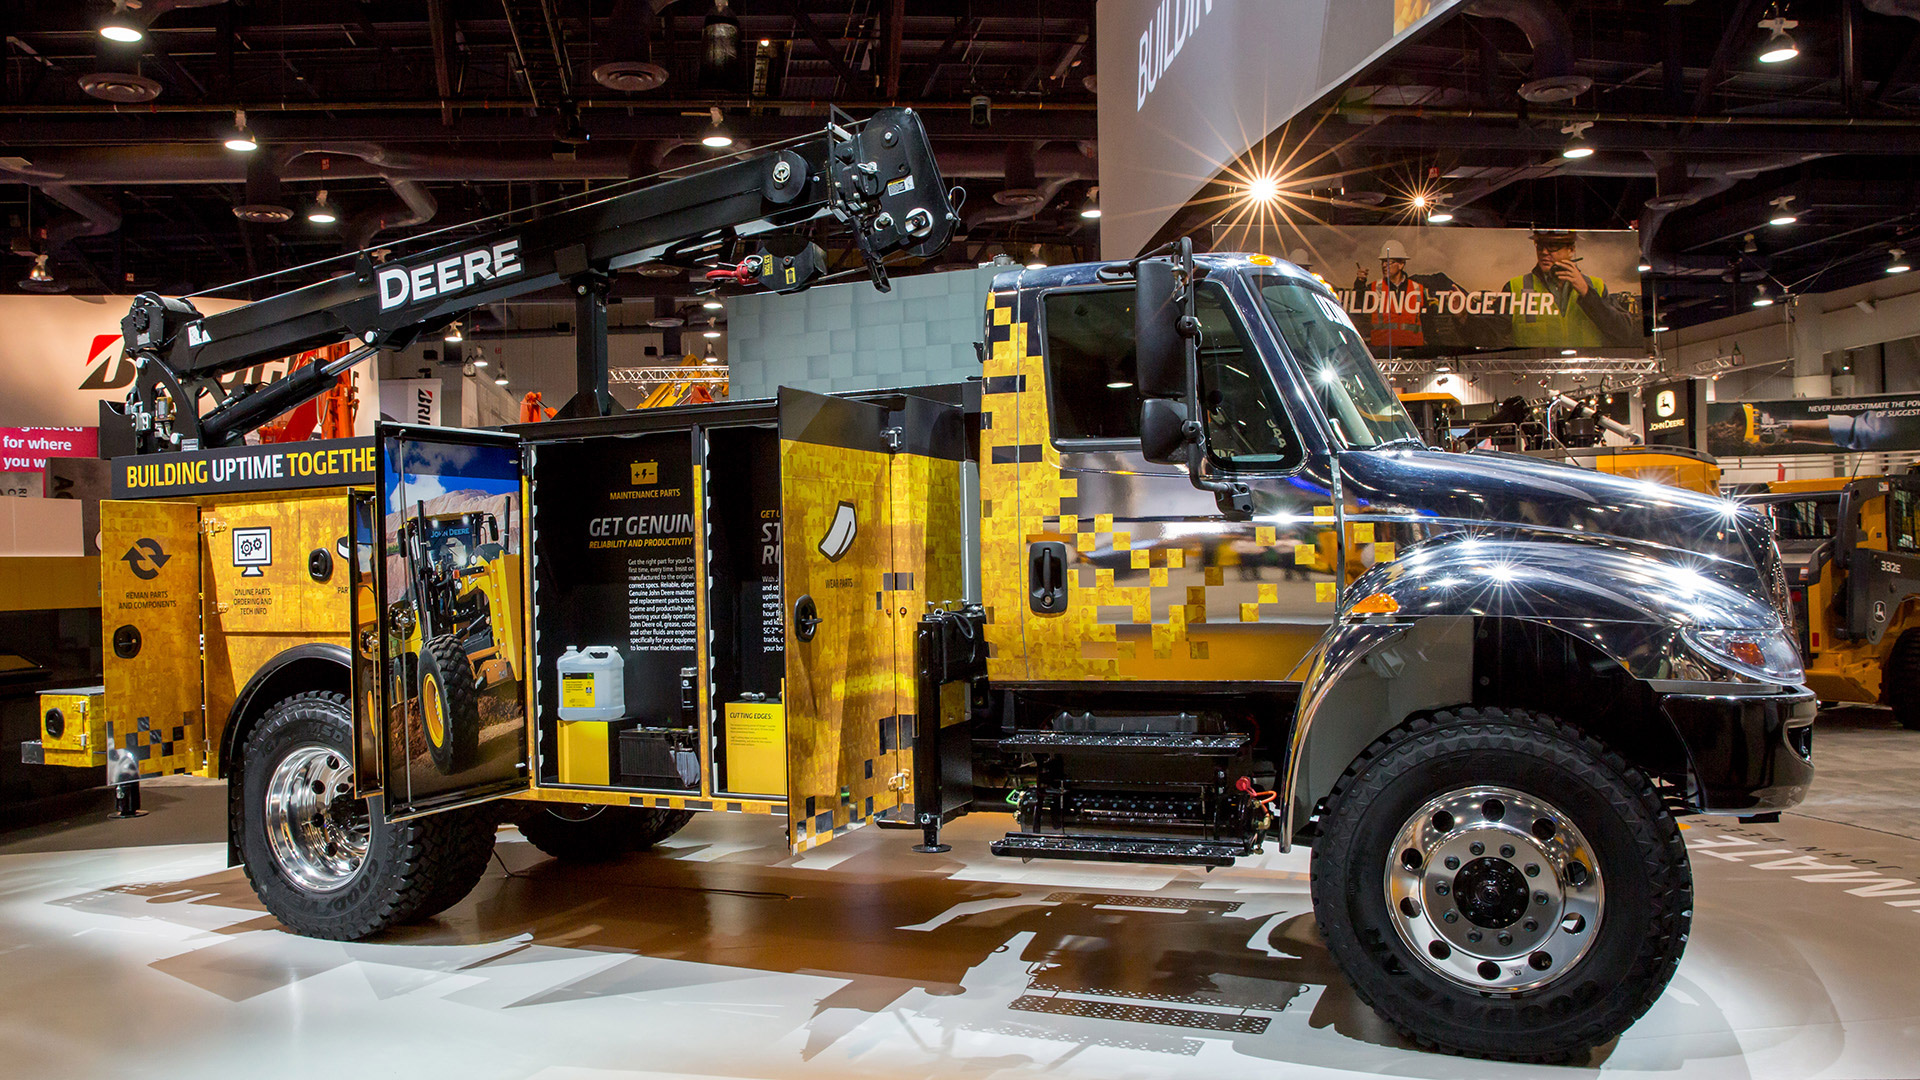 John Deere ConExpo Service Truck Display at 2014 ConExpo